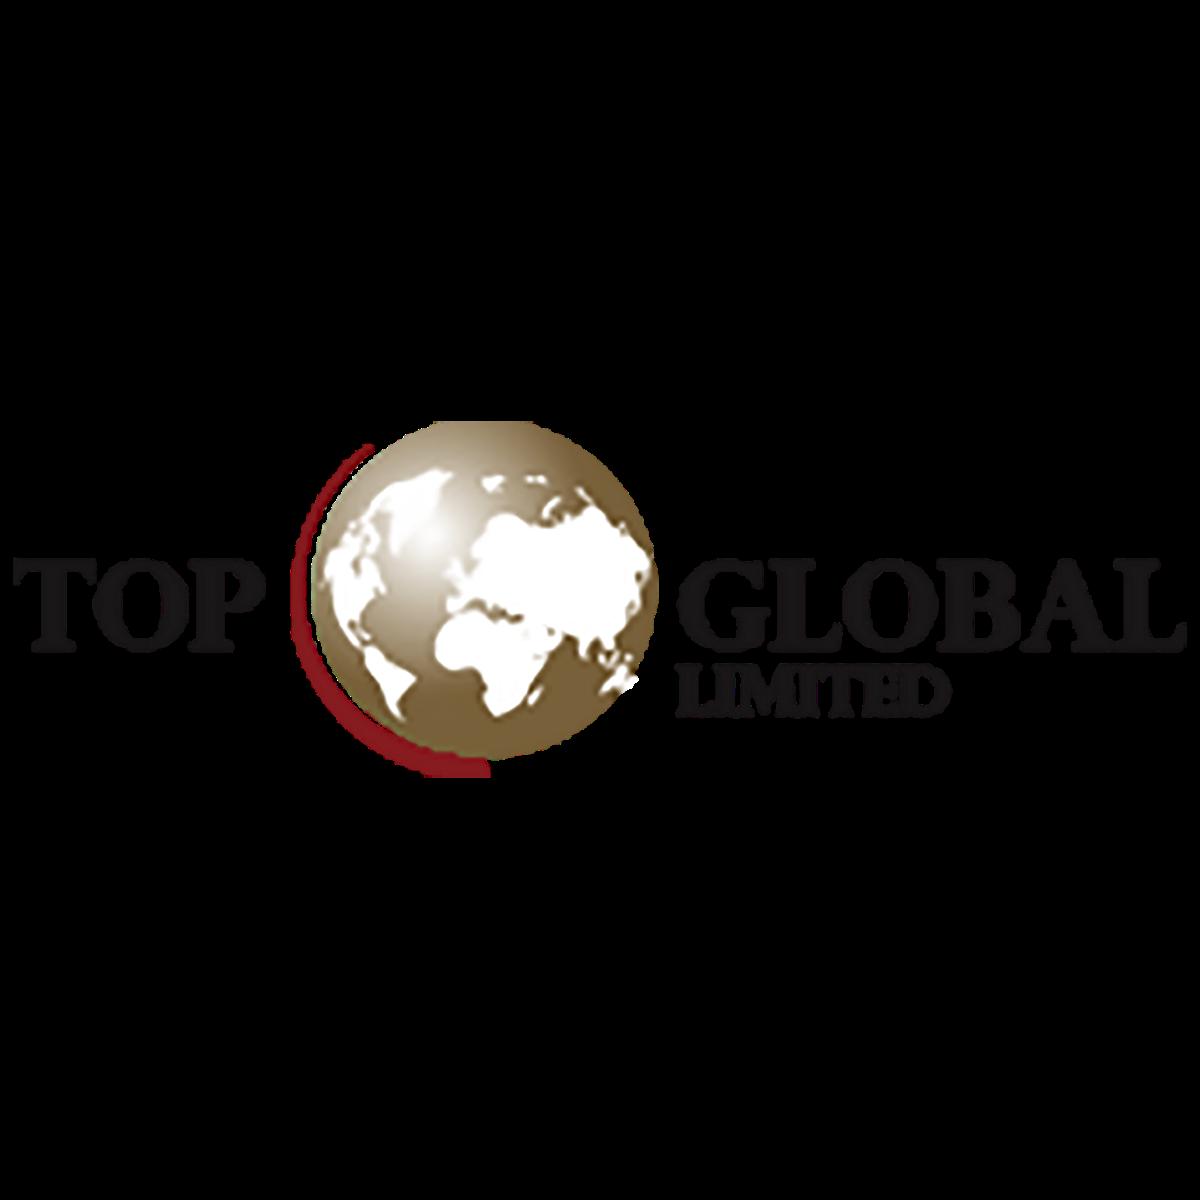 TOP GLOBAL LIMITED (SGX:BHO) @ SGinvestors.io